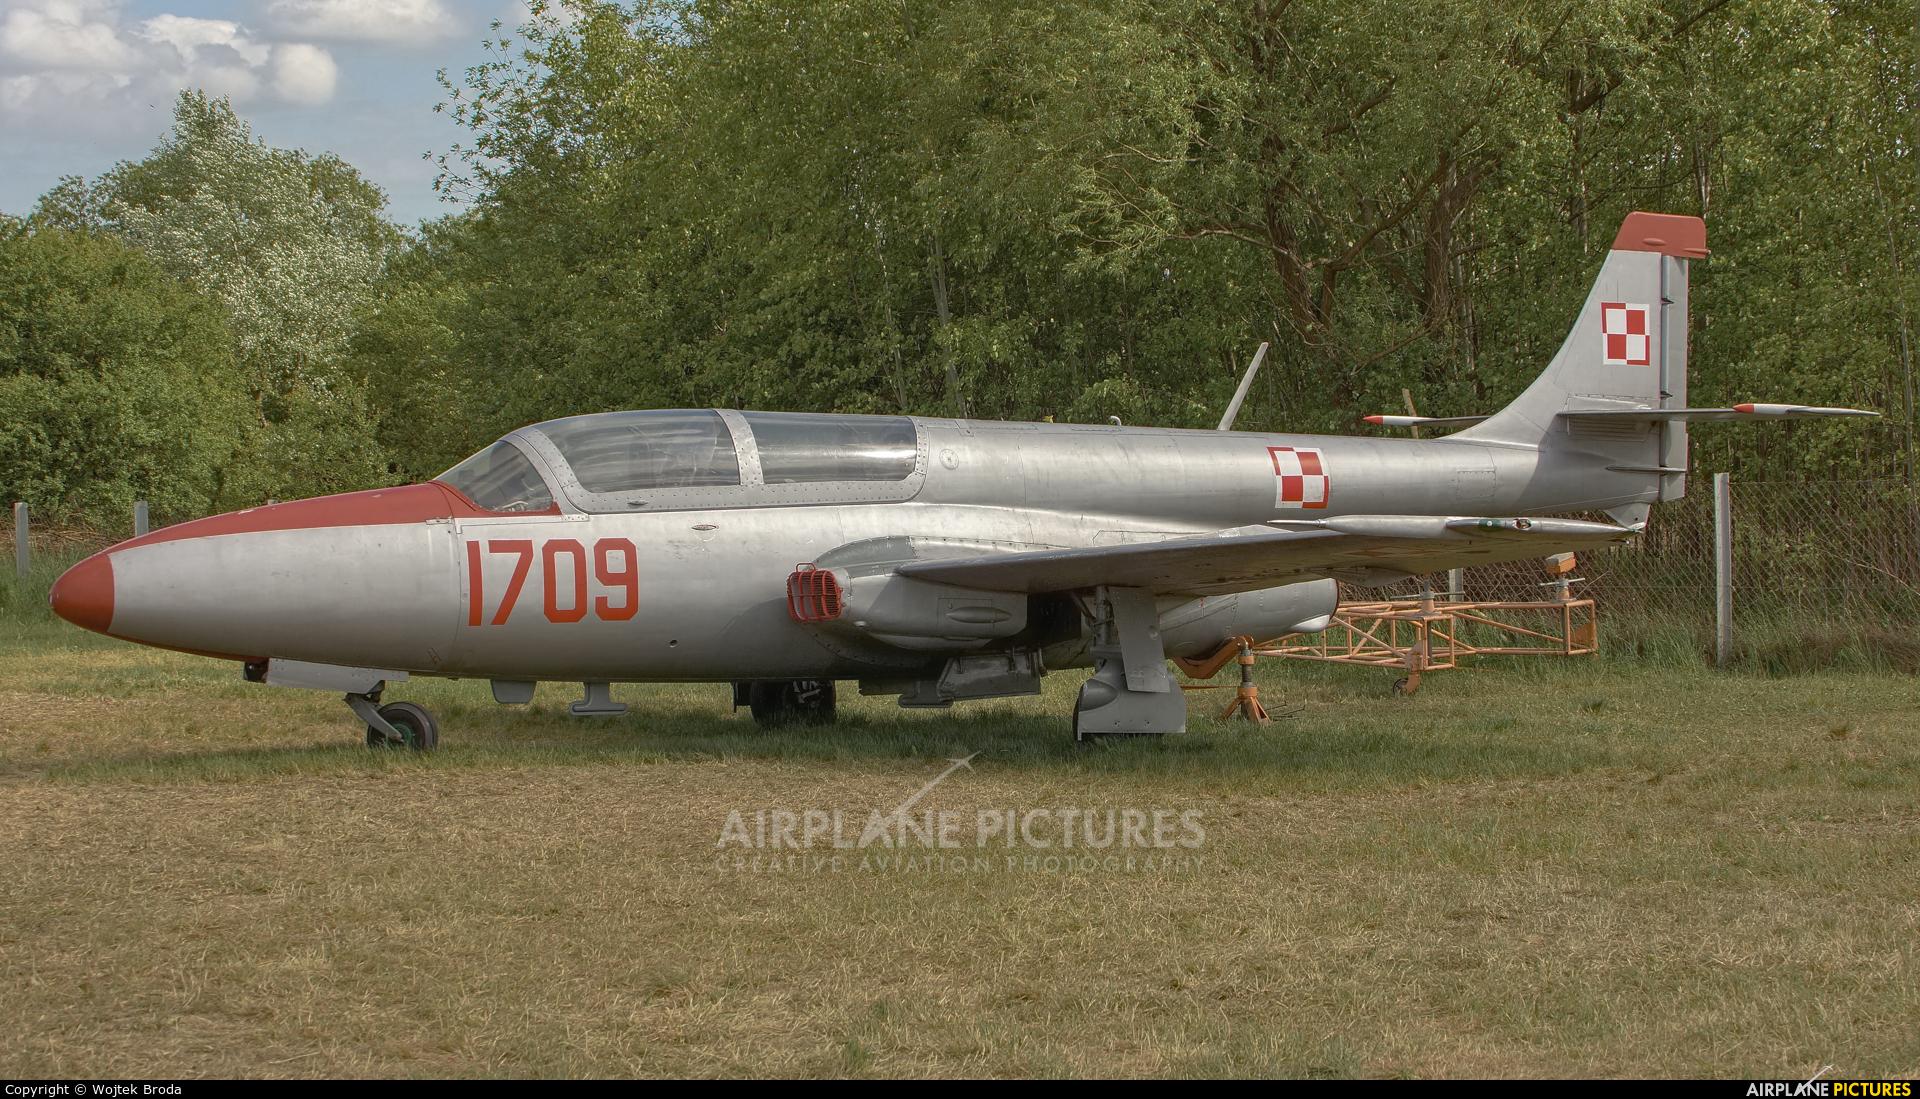 Poland - Air Force 1709 aircraft at Wrocław - Szymanów